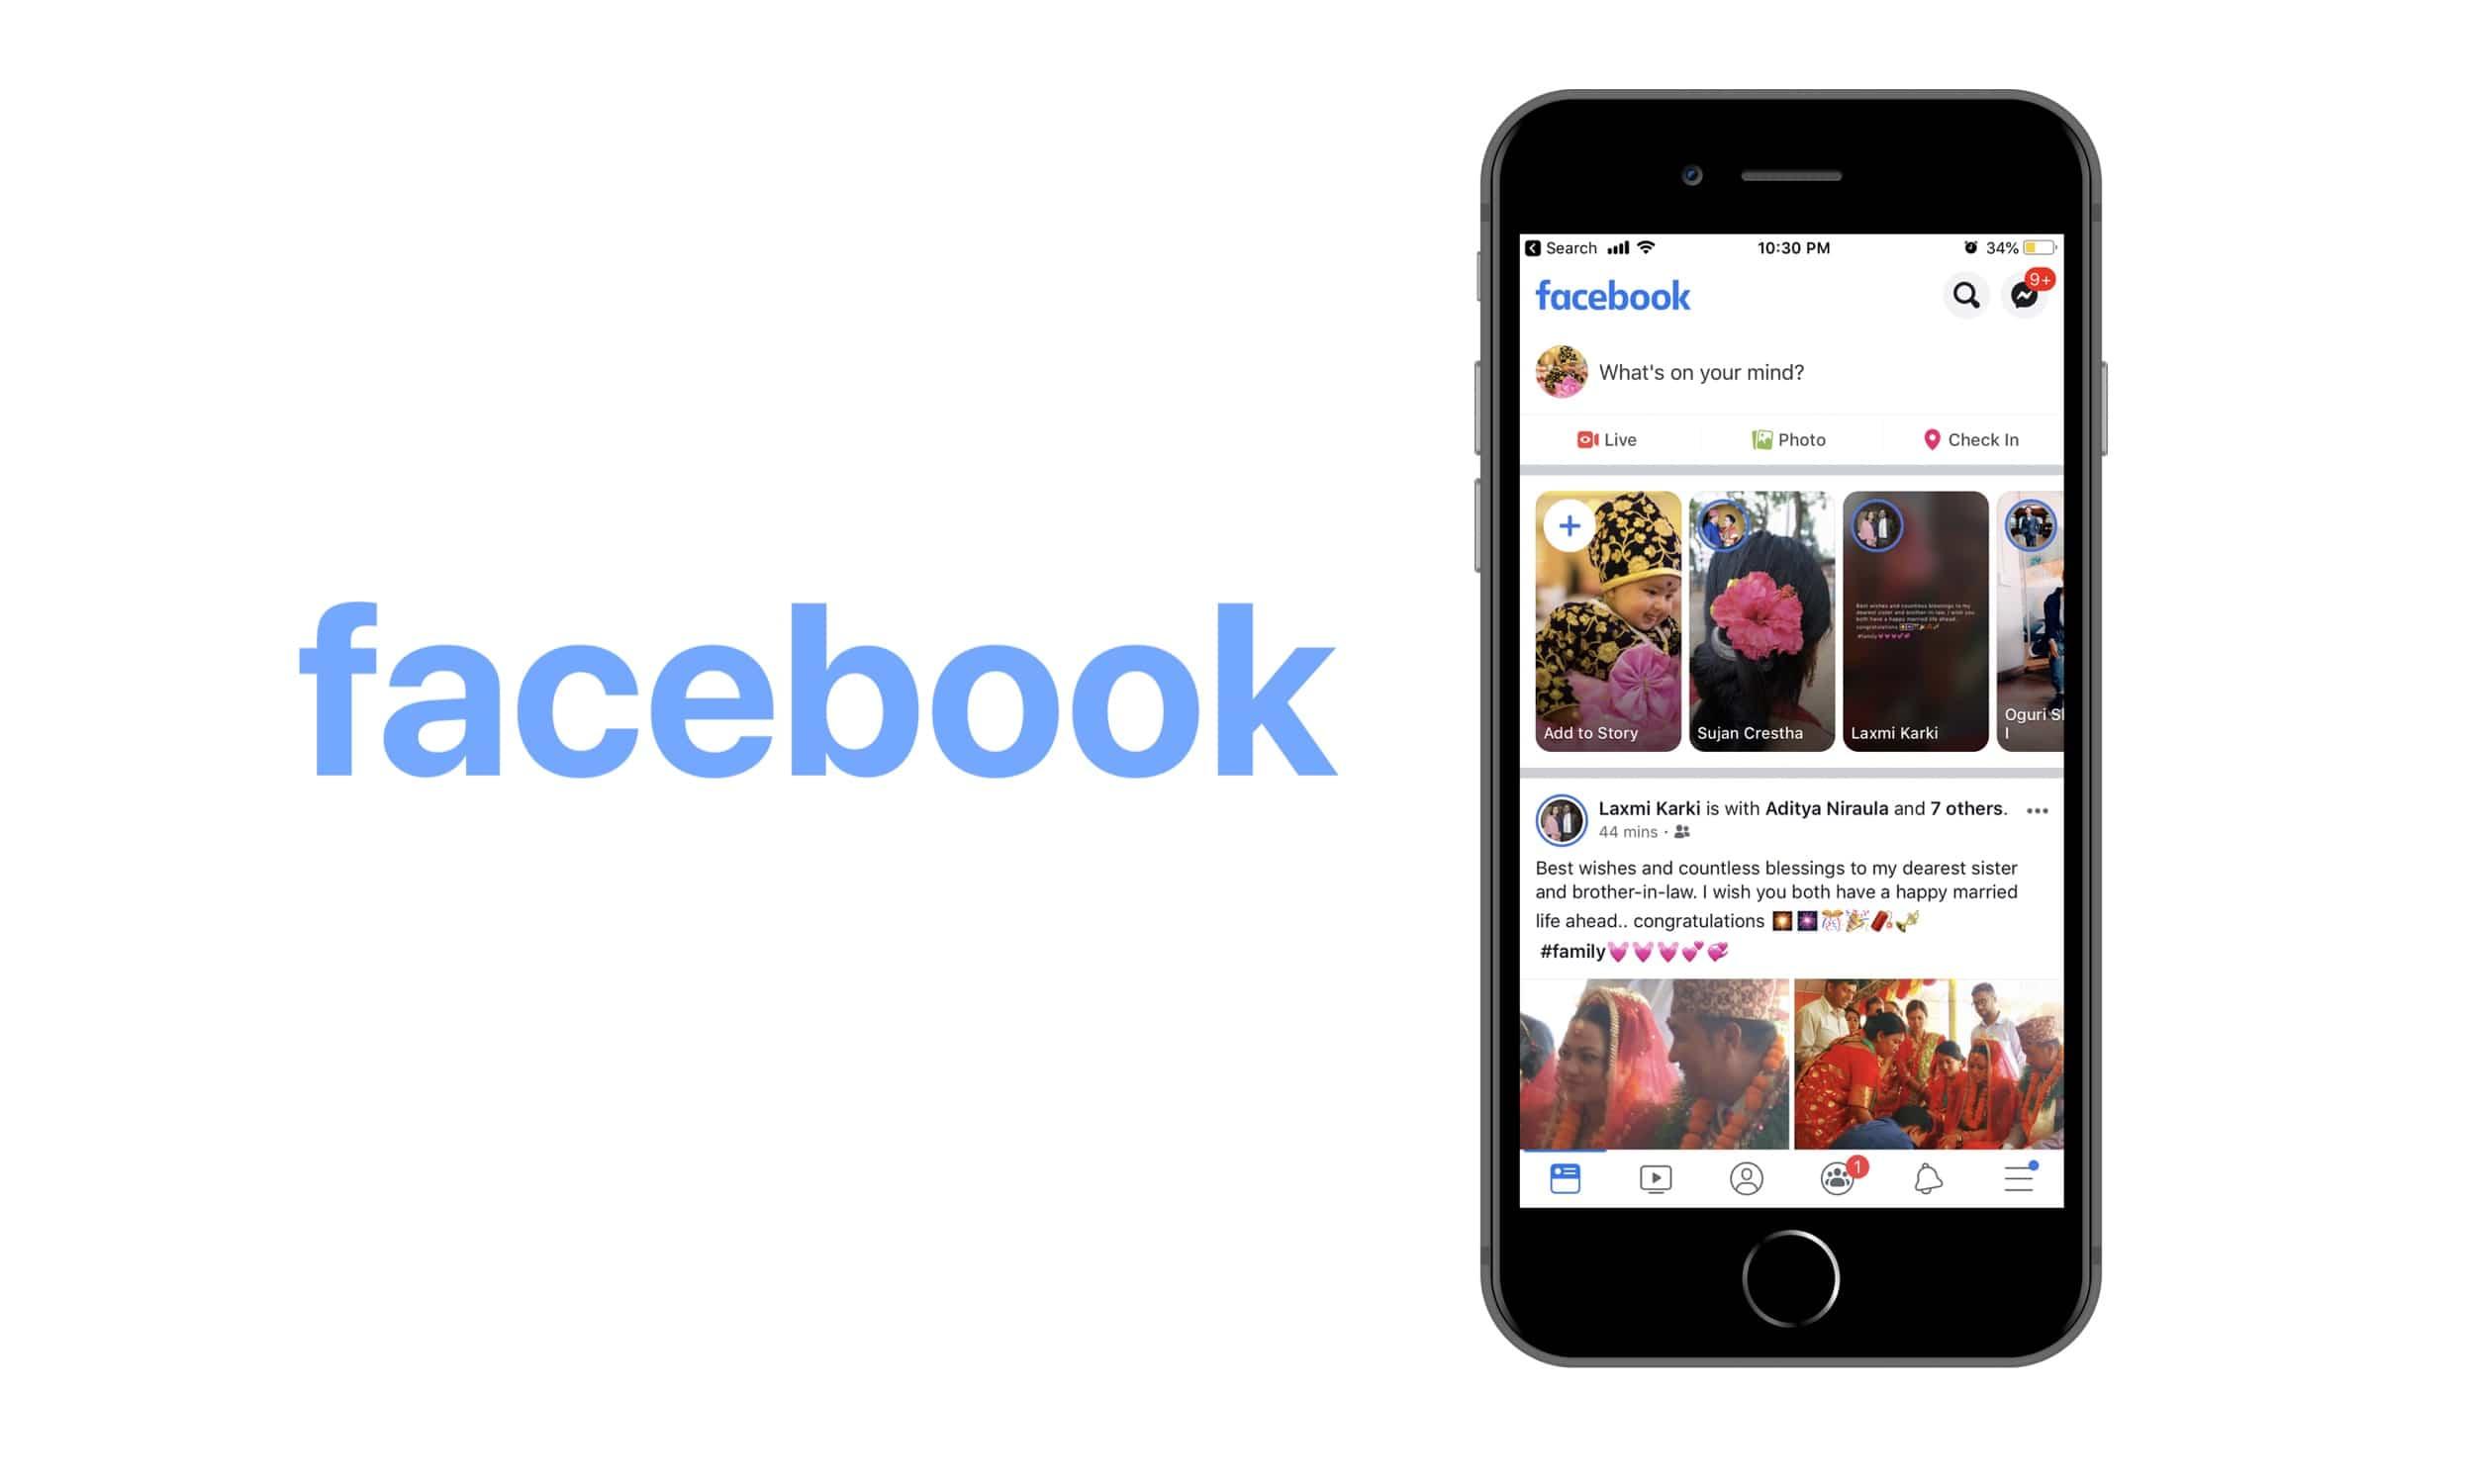 facebook-new-design-update-ios-min